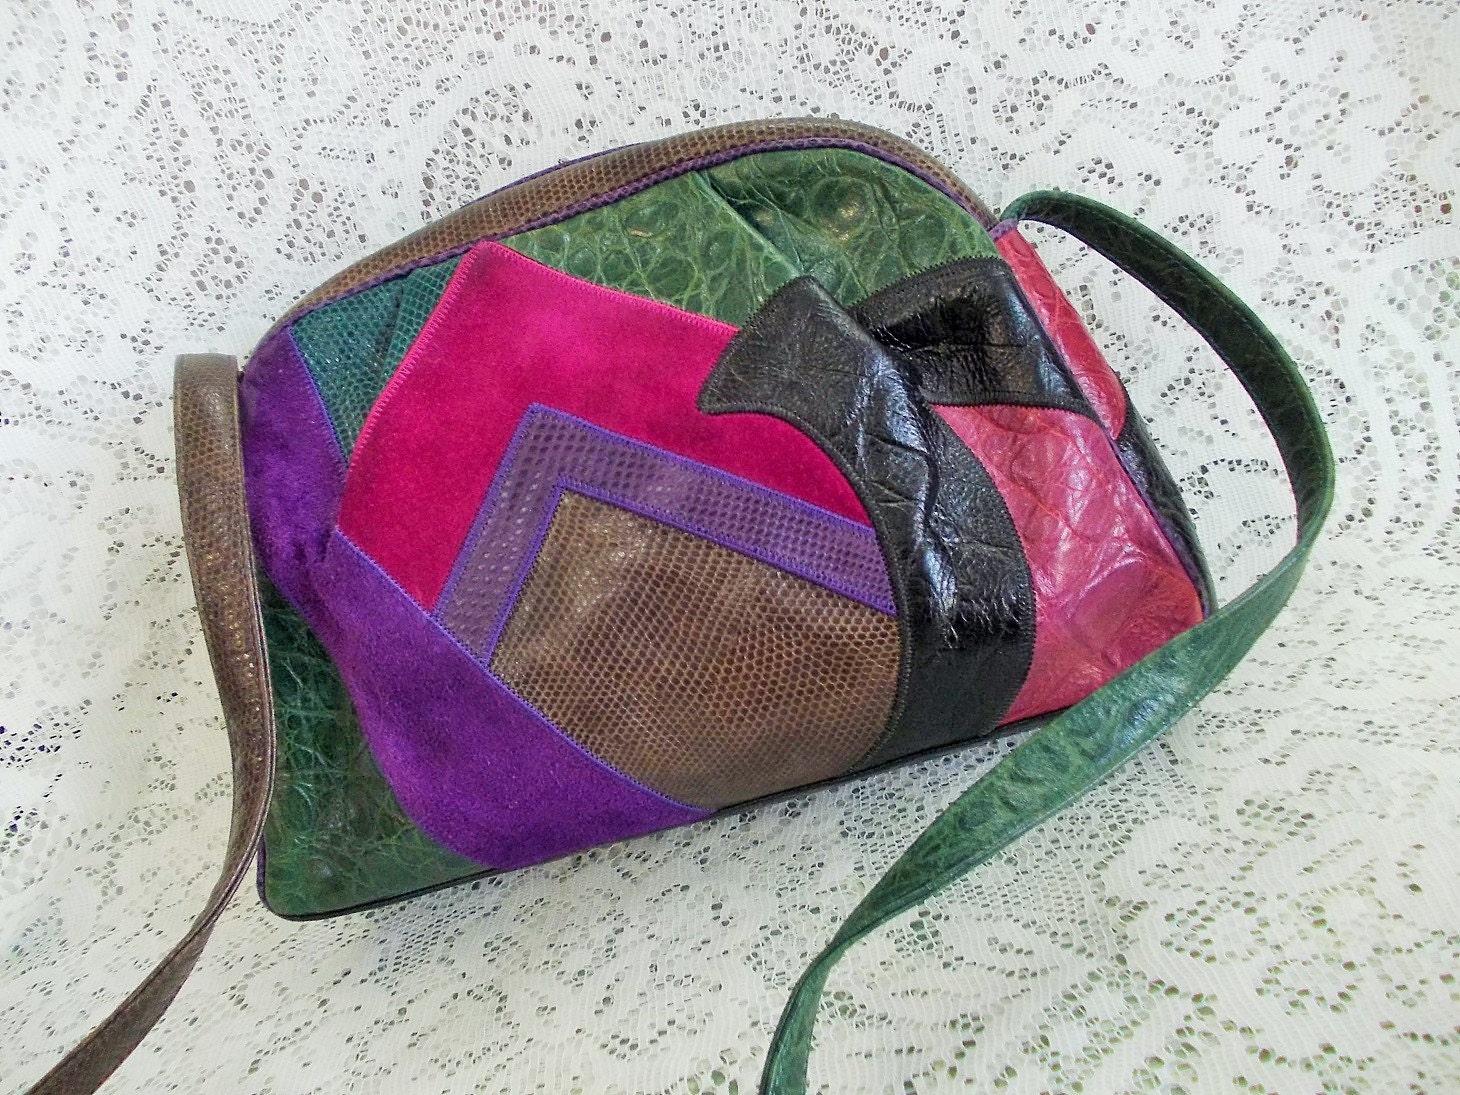 Couture Patchwork Suede & Leather Handbag, Sharif USA